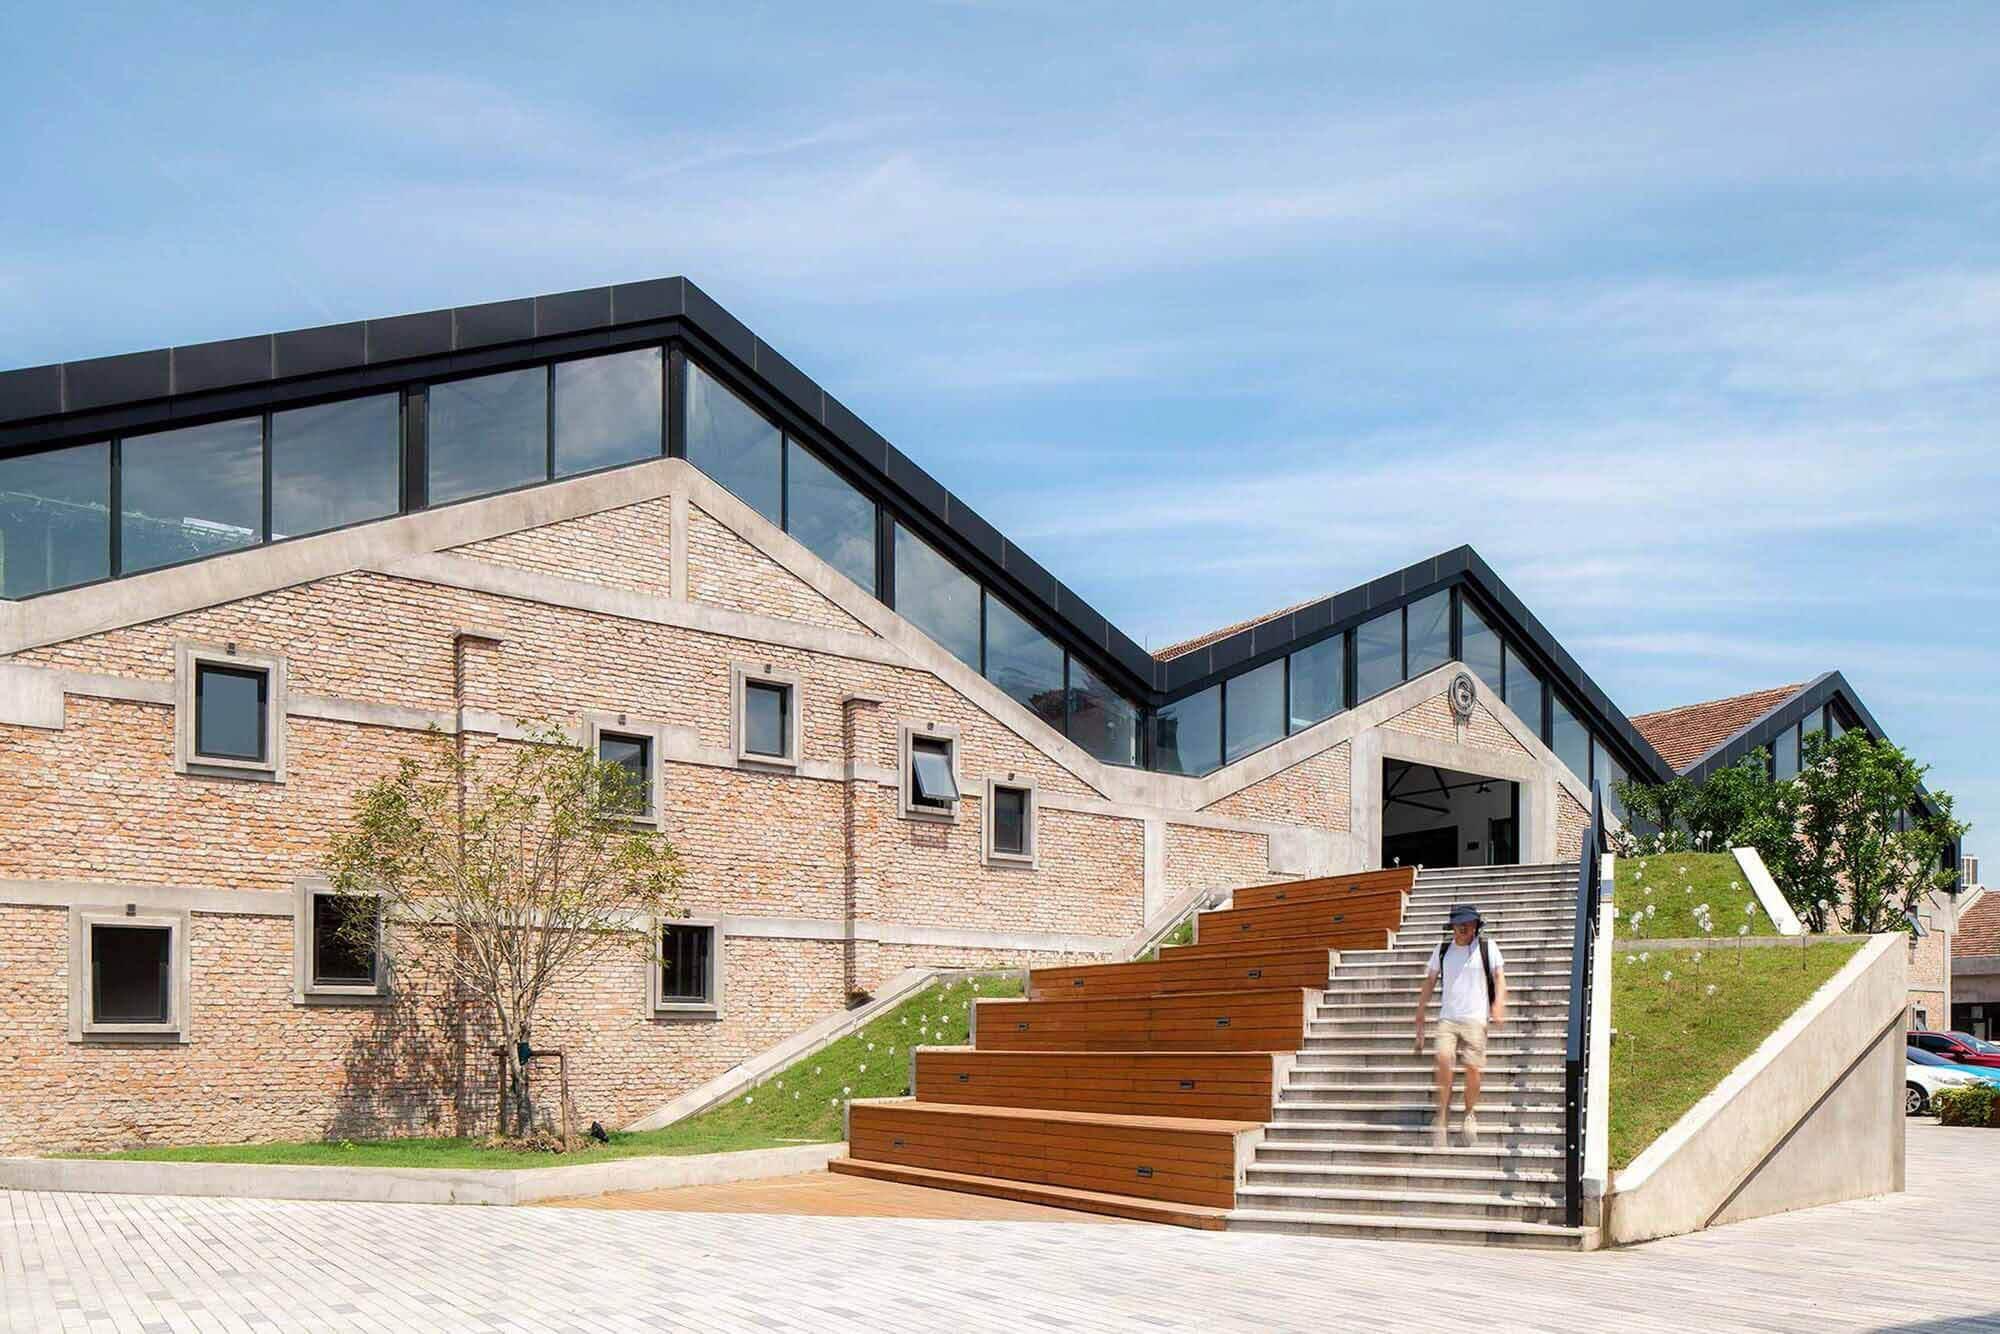 Центр творческой индустрии Jiuli Workspace / Архитектор + Студия архитектурного дизайна